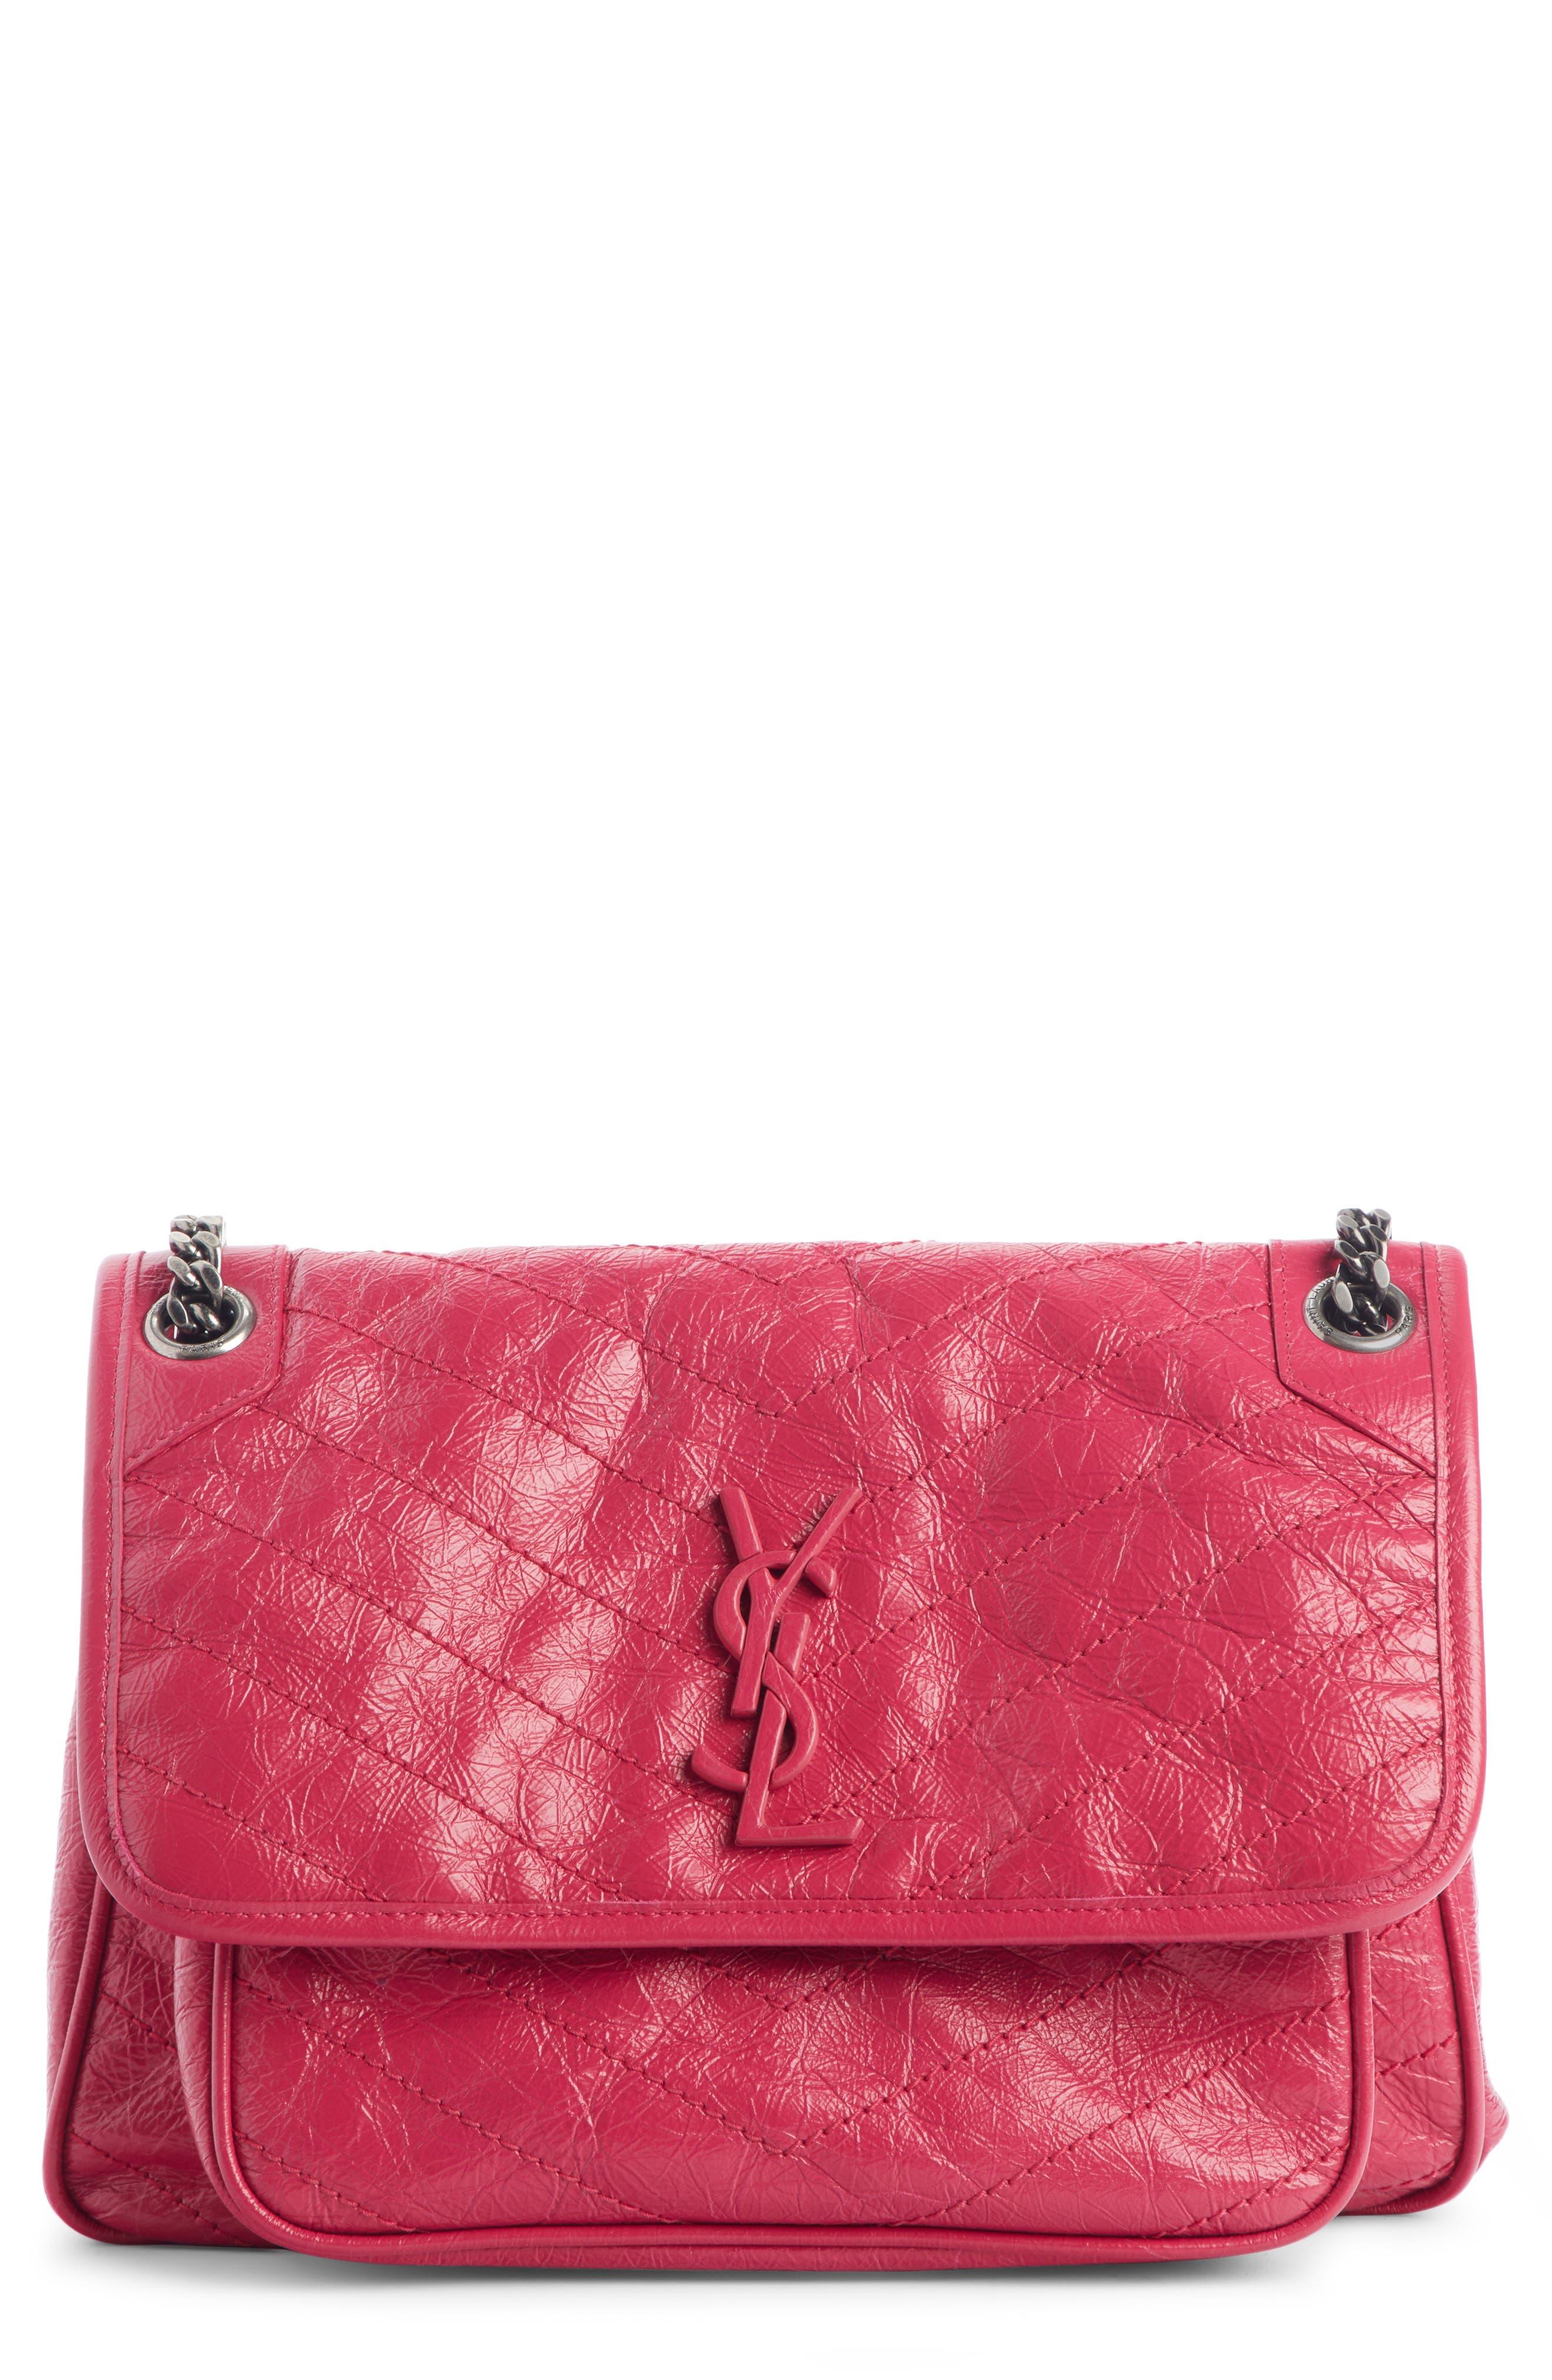 ,                             Medium Niki Leather Shoulder Bag,                             Main thumbnail 1, color,                             FREESIA/ FREESIA